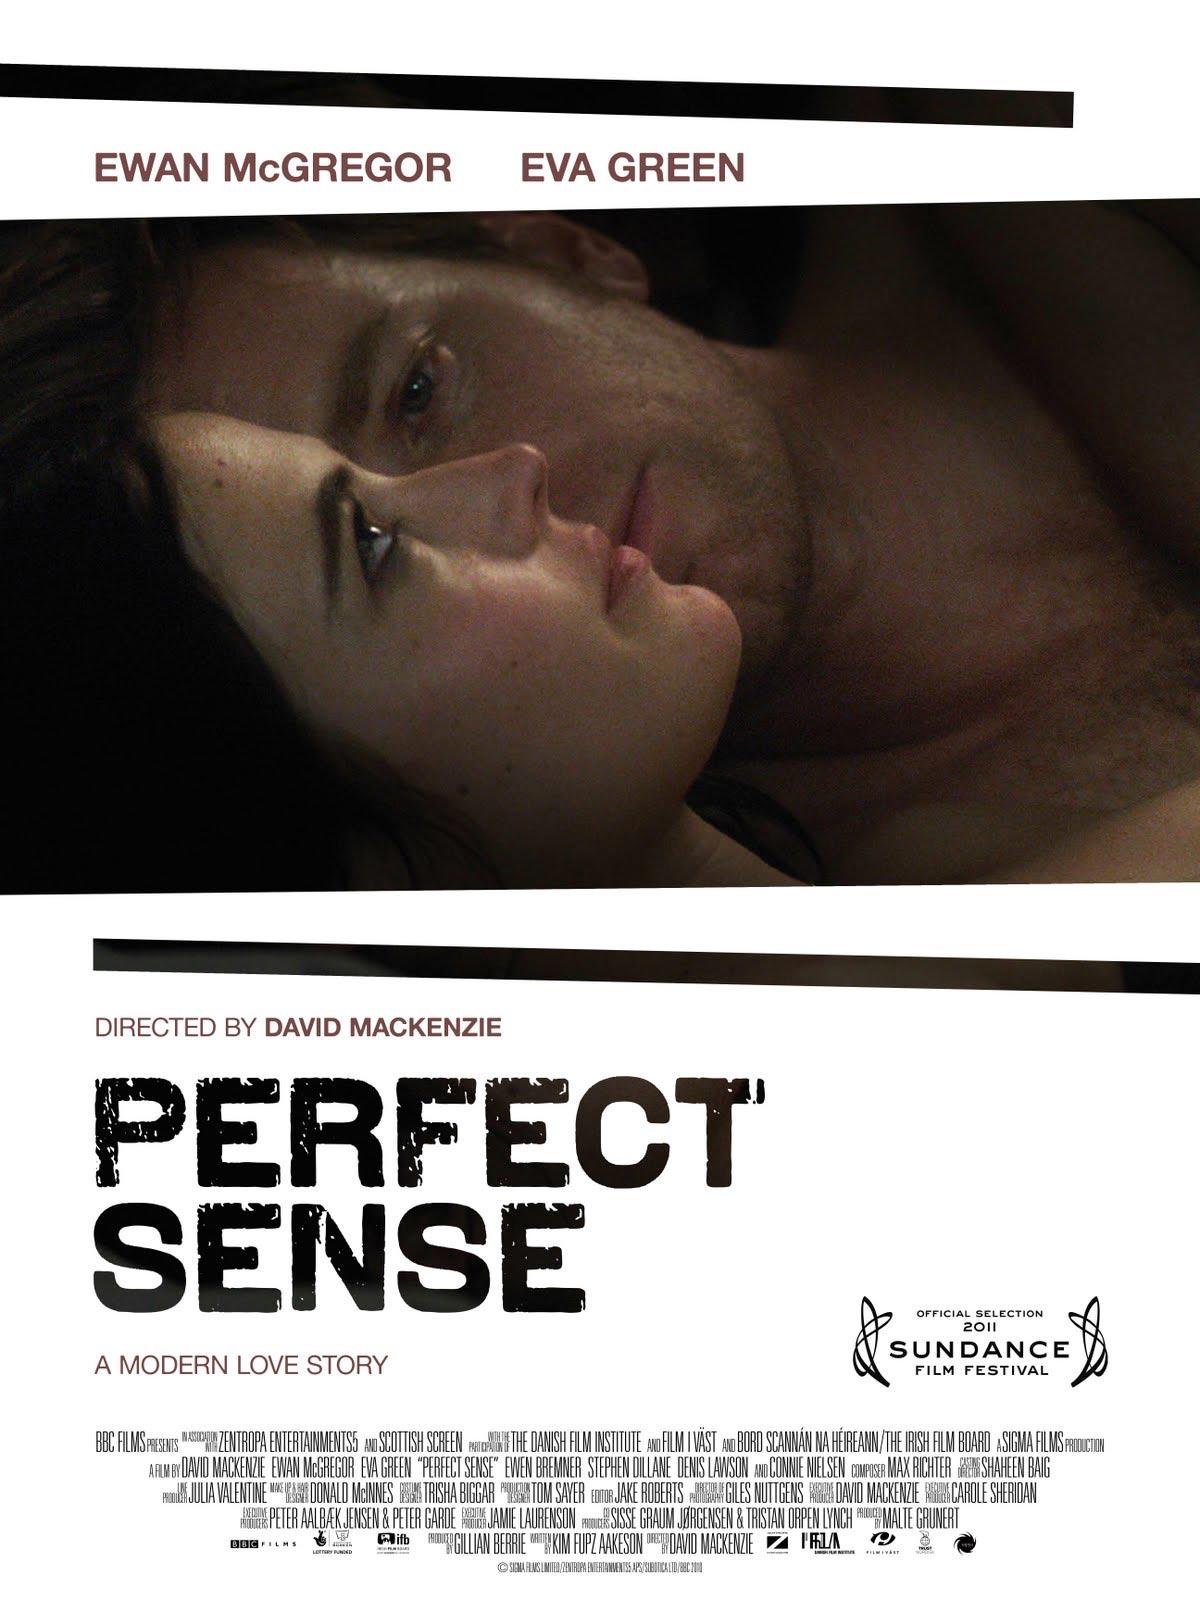 http://www.filmofilia.com/wp-content/uploads/2011/01/Perfect-Sense-Poster.jpg